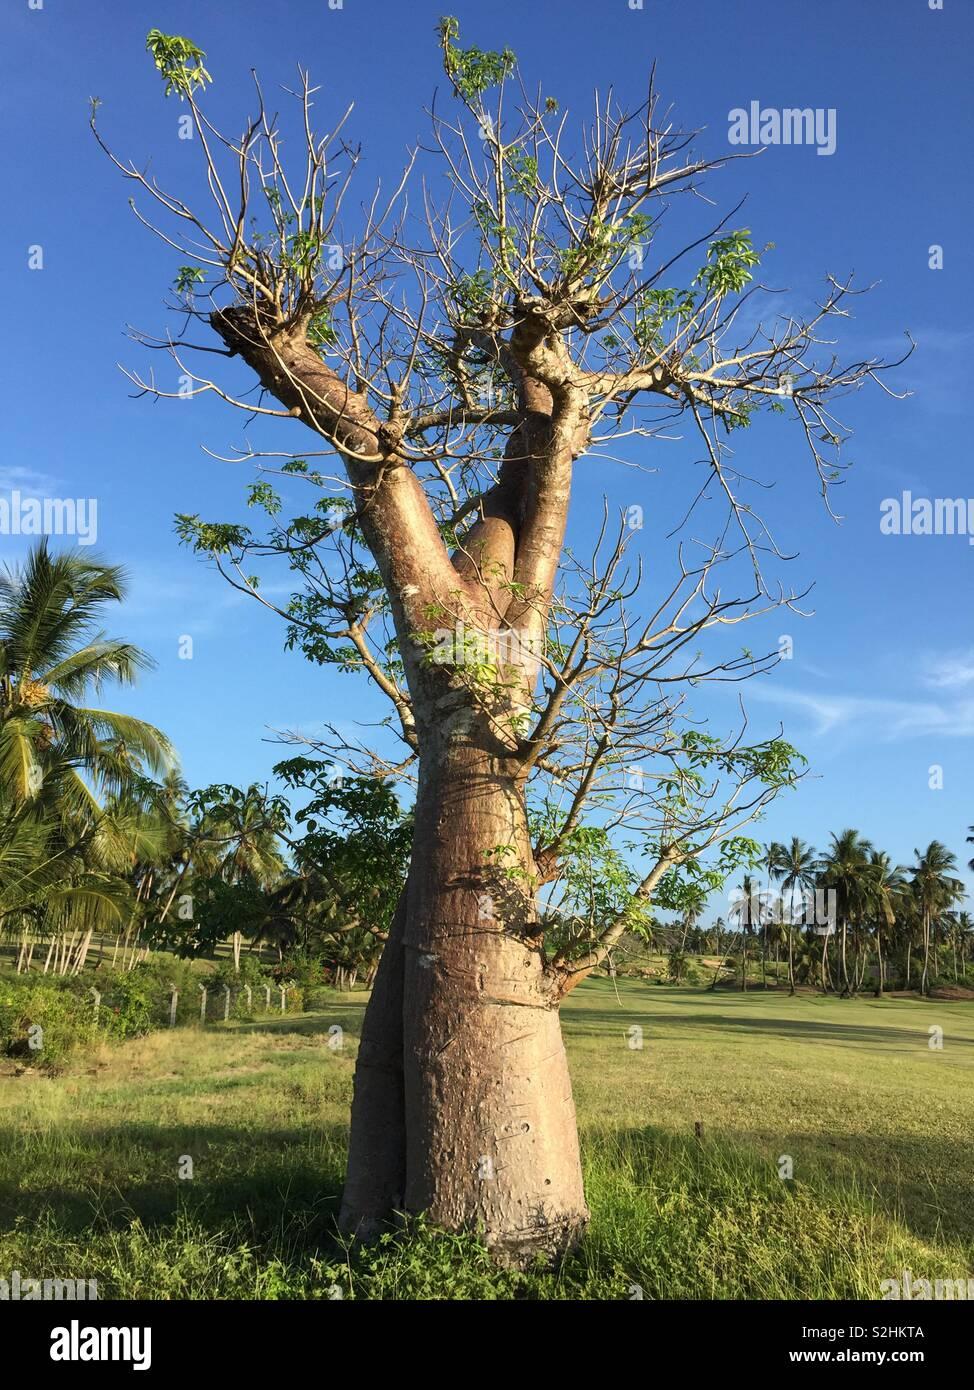 African bottle tree - Stock Image